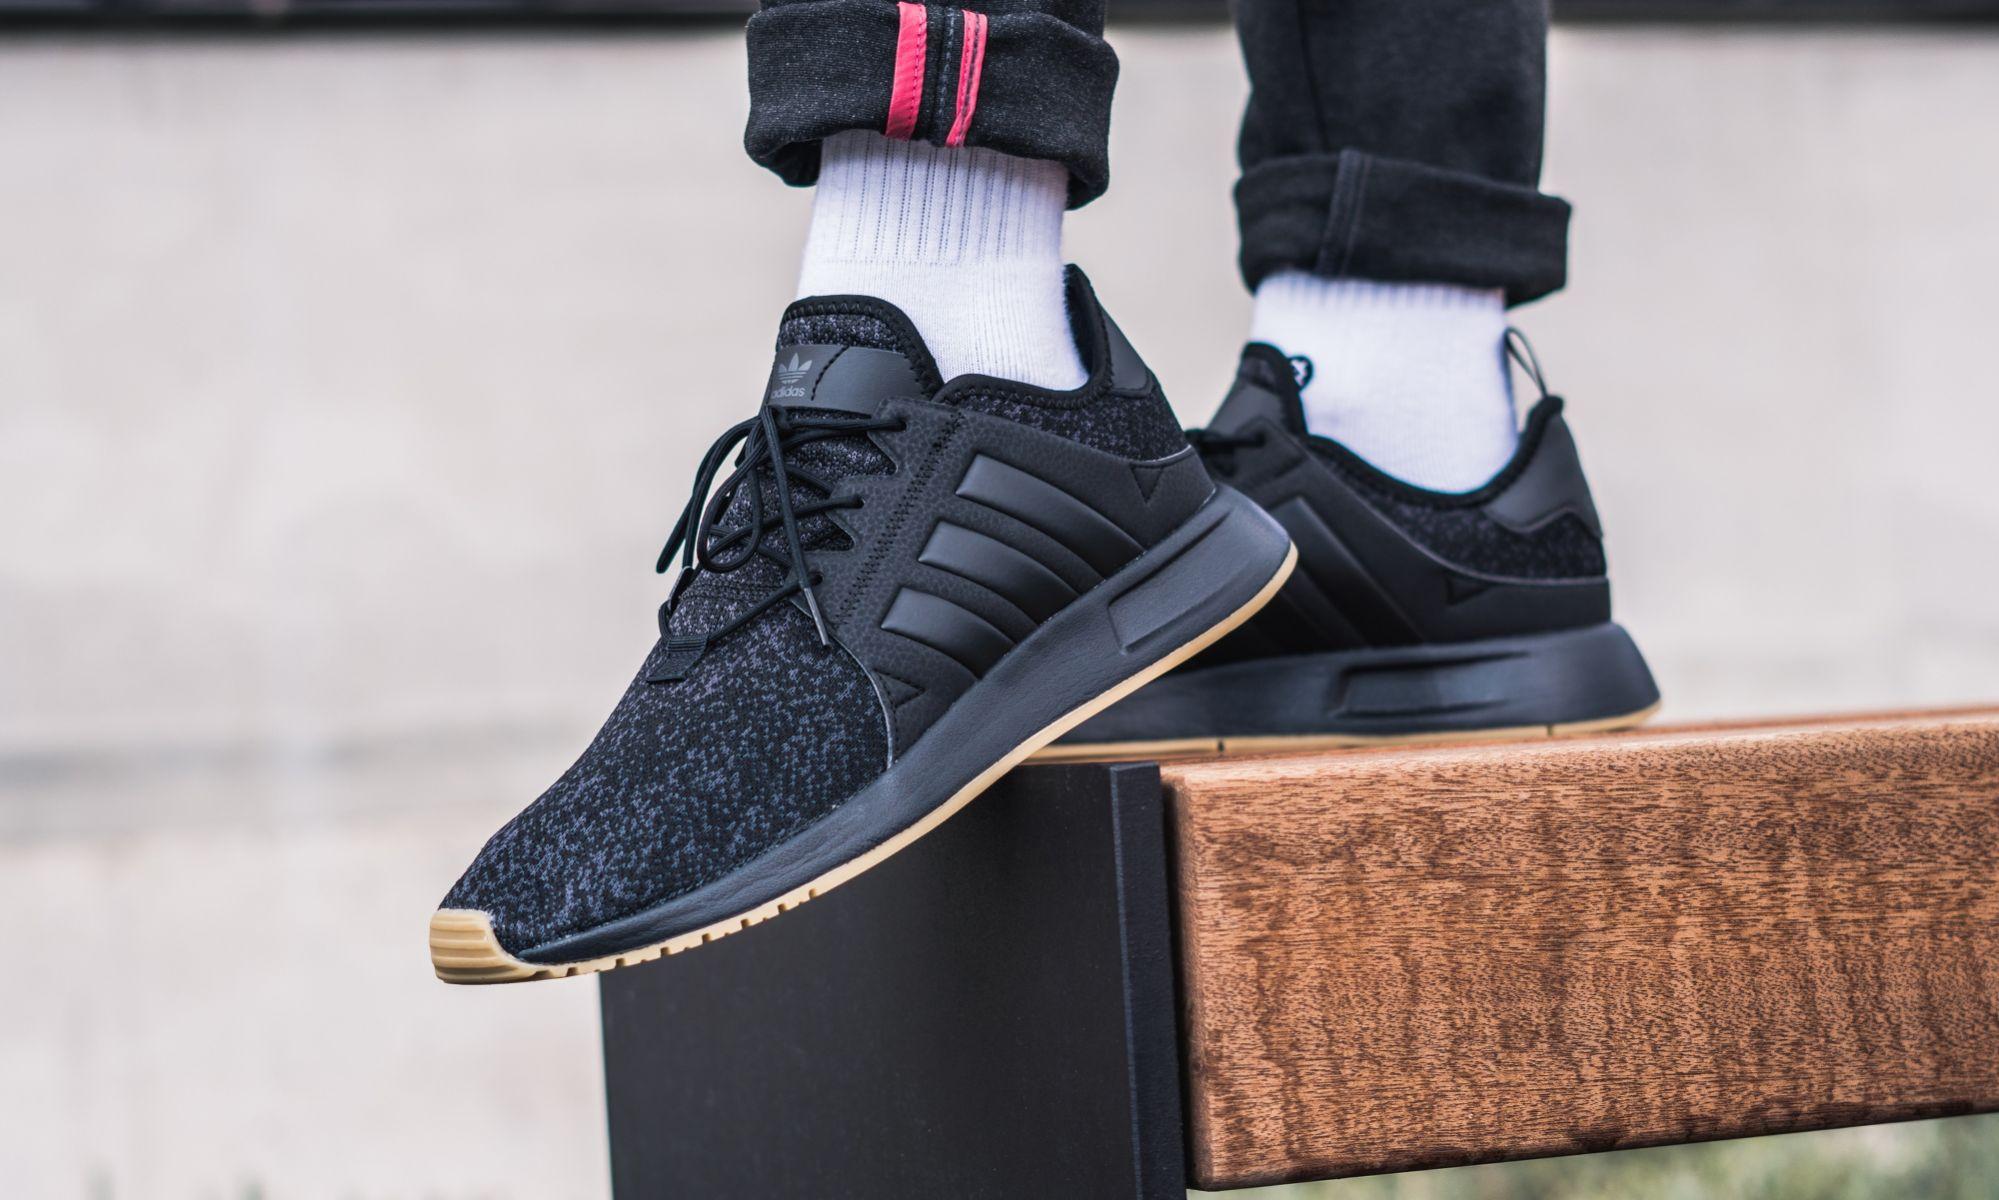 huge selection of e647e a388f Adidas-Originals-Trefoil-Scarpe-Sneakers-Trainers-Sportive-Nero-